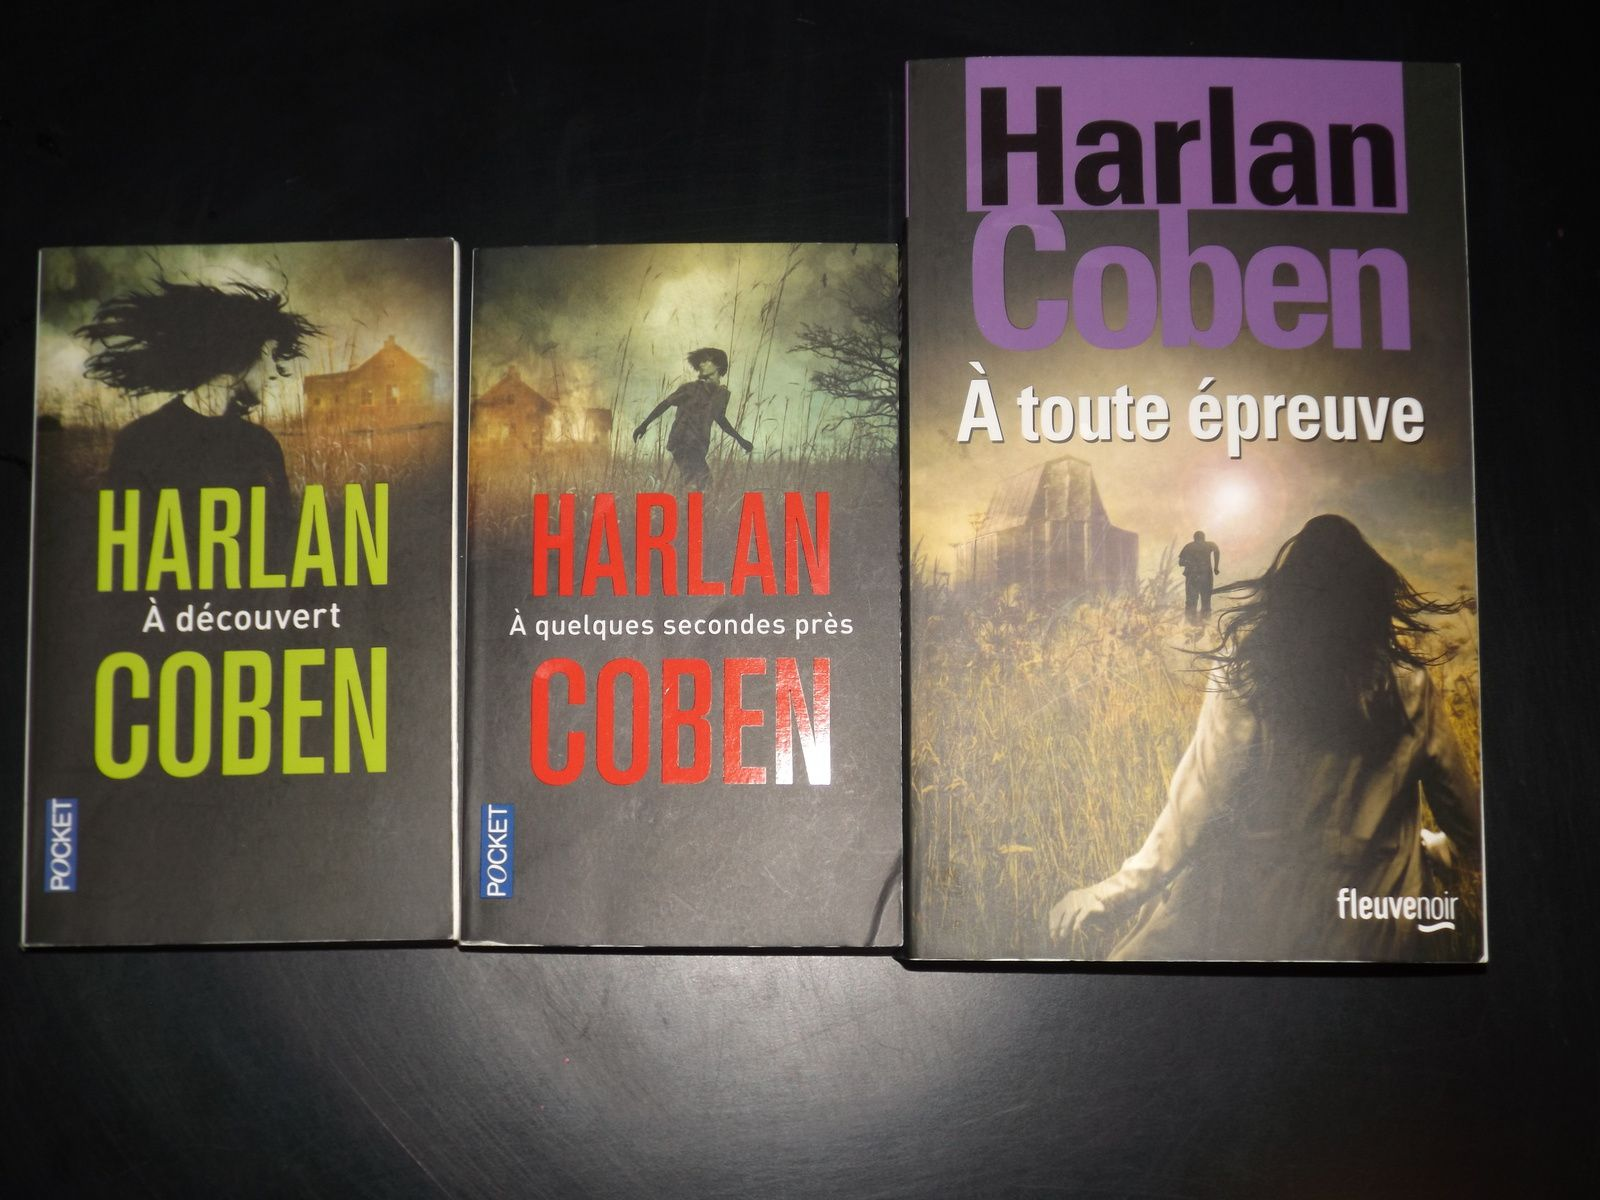 Les aventures de Mickey Bolitar, Harlan Coben